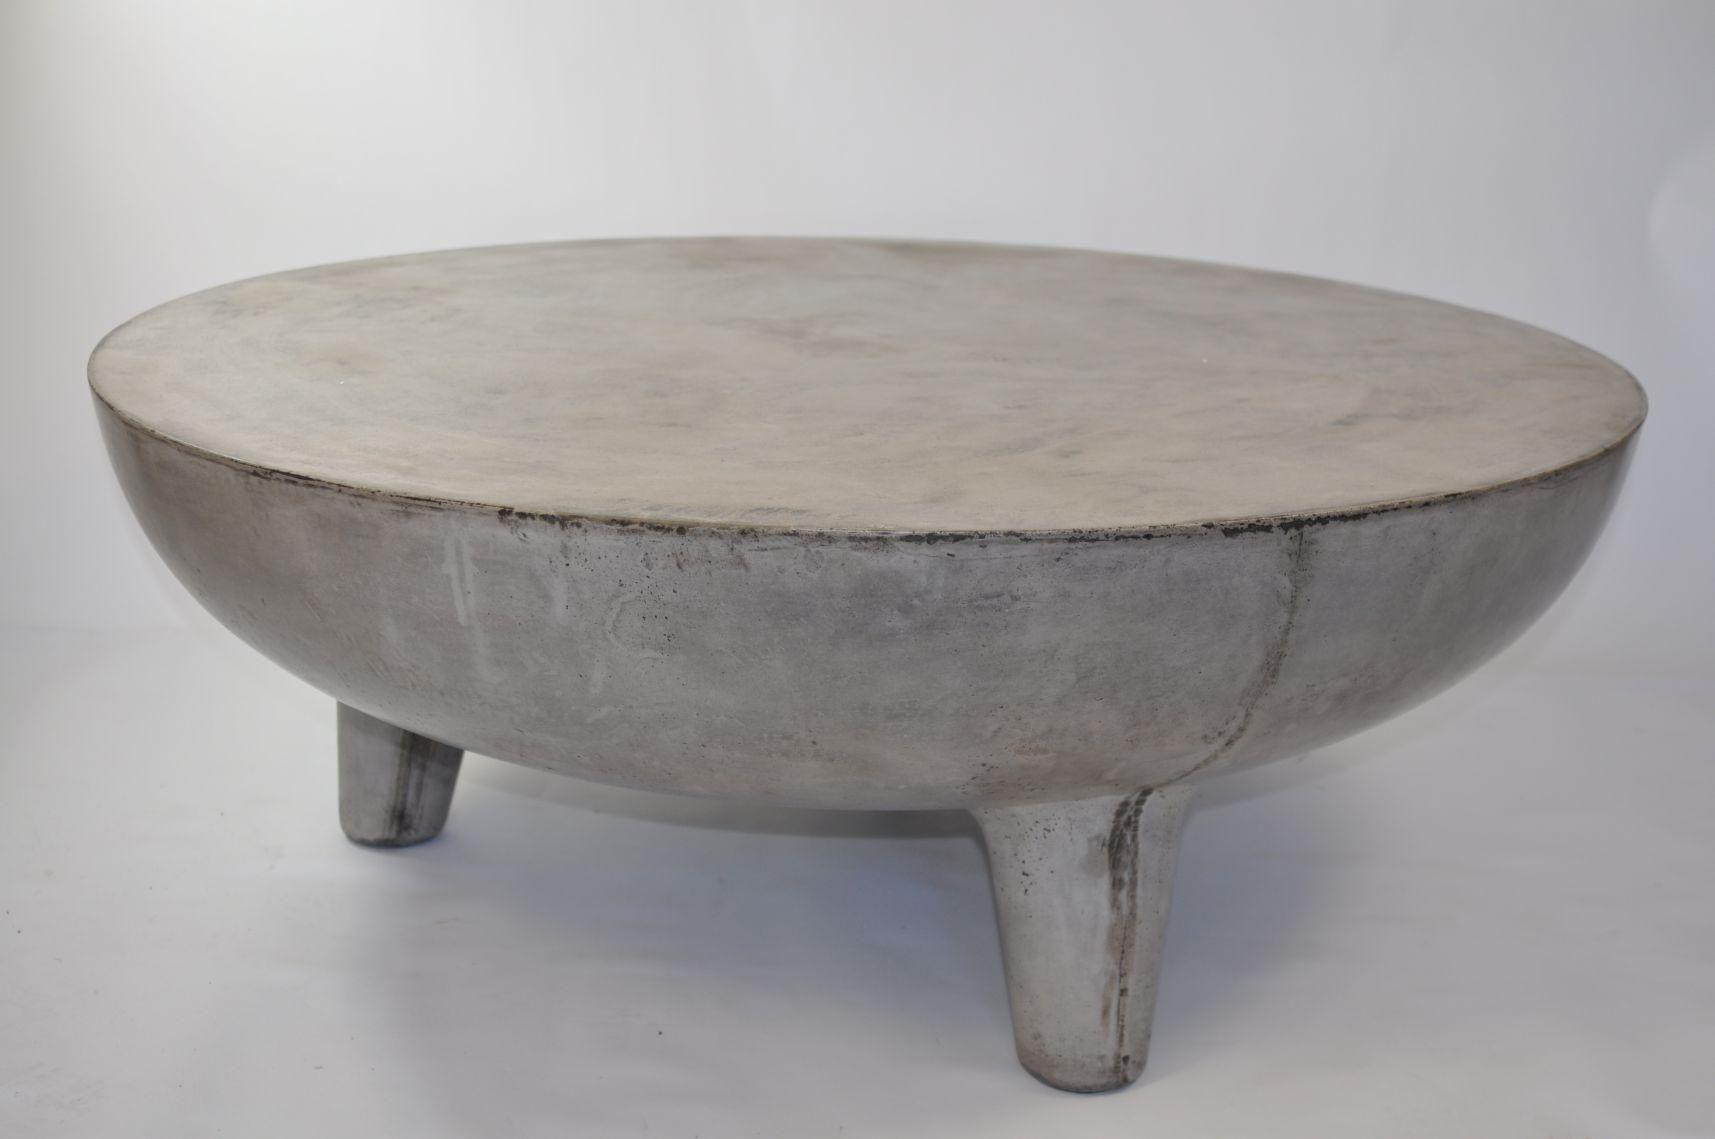 Diy Round Coffee Table Unique Lovely Ideas Concrete Round Coffee